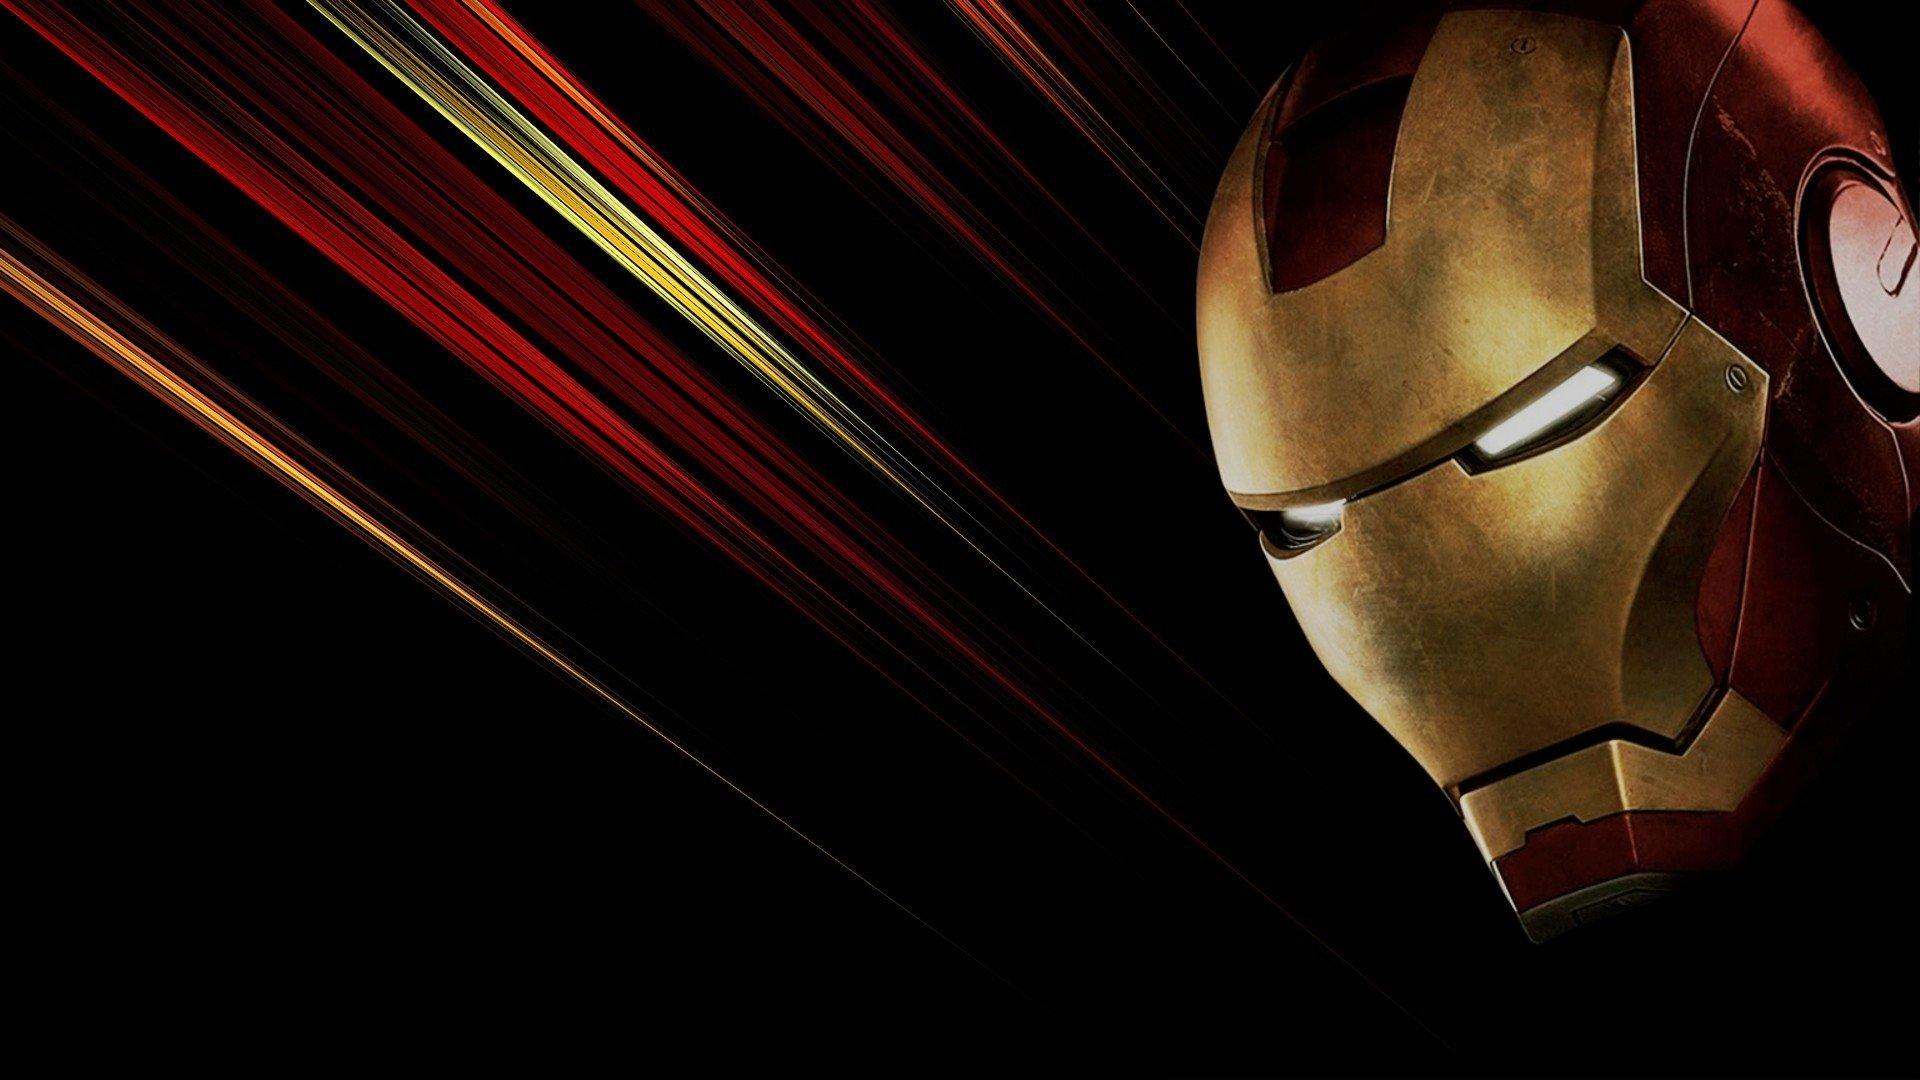 Iron man full hd fond d 39 cran and arri re plan 1920x1080 id 403879 - Iron man telecharger ...